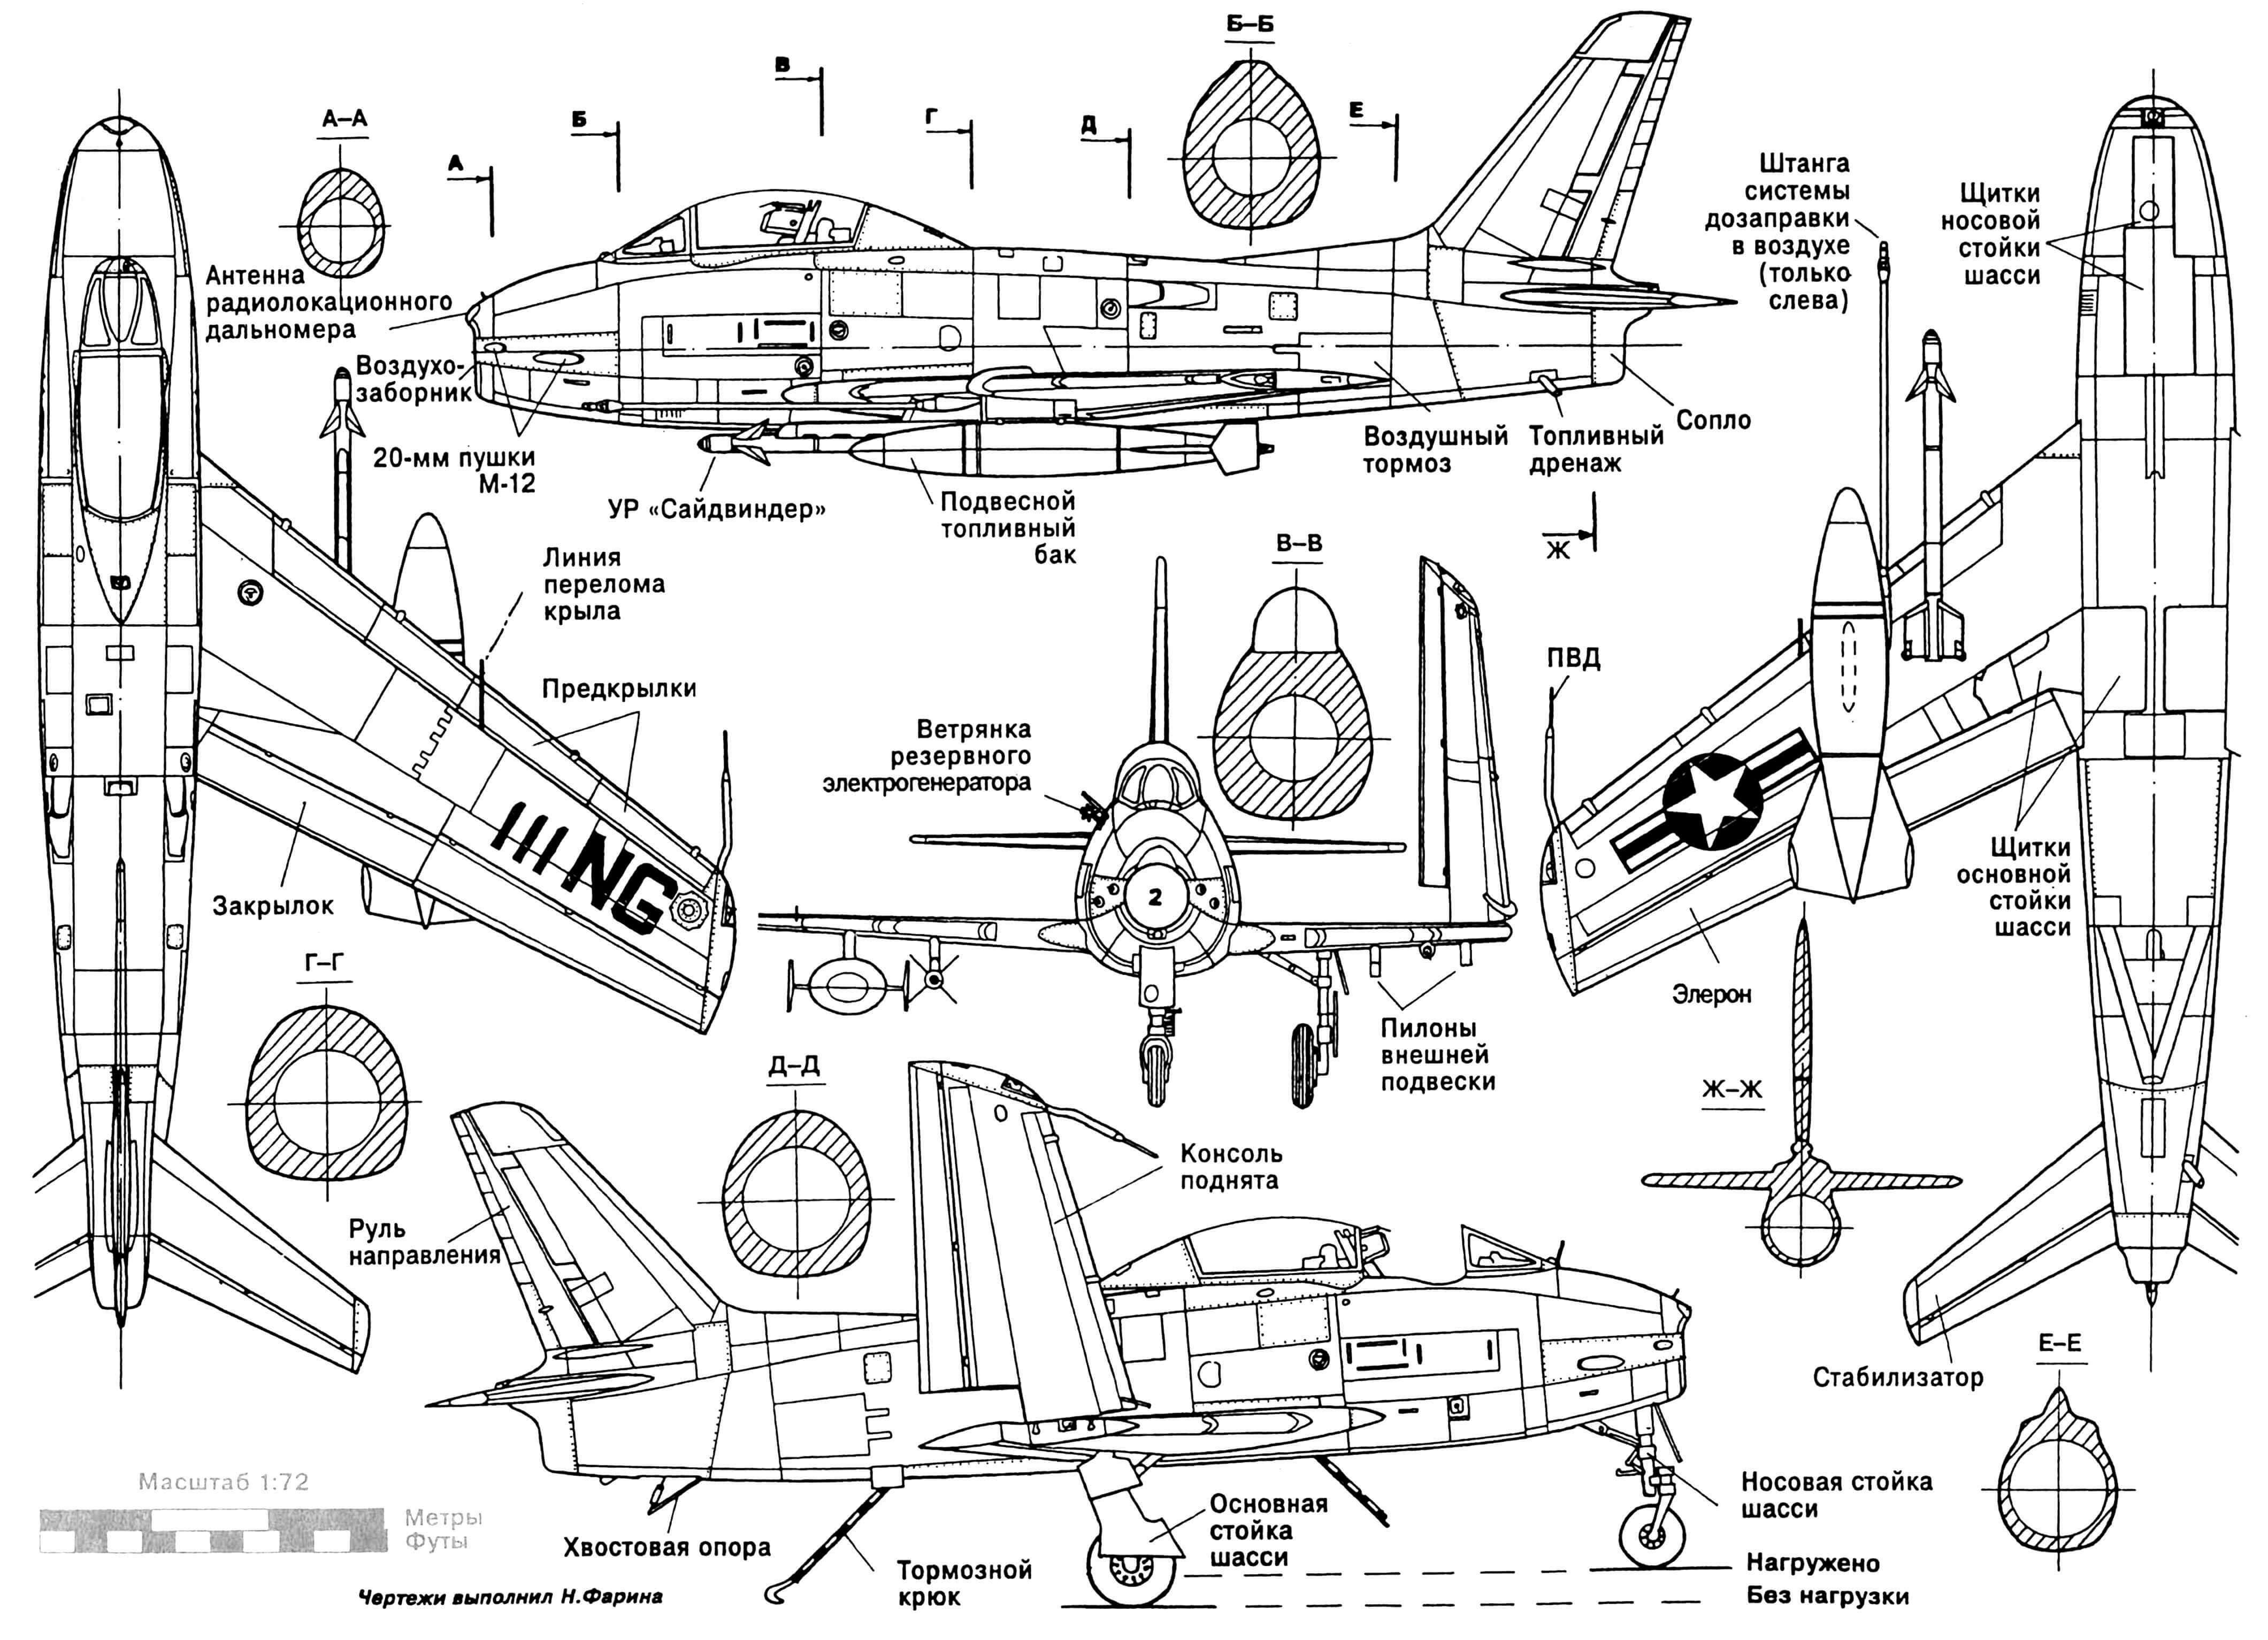 North American FJ-3M Fury